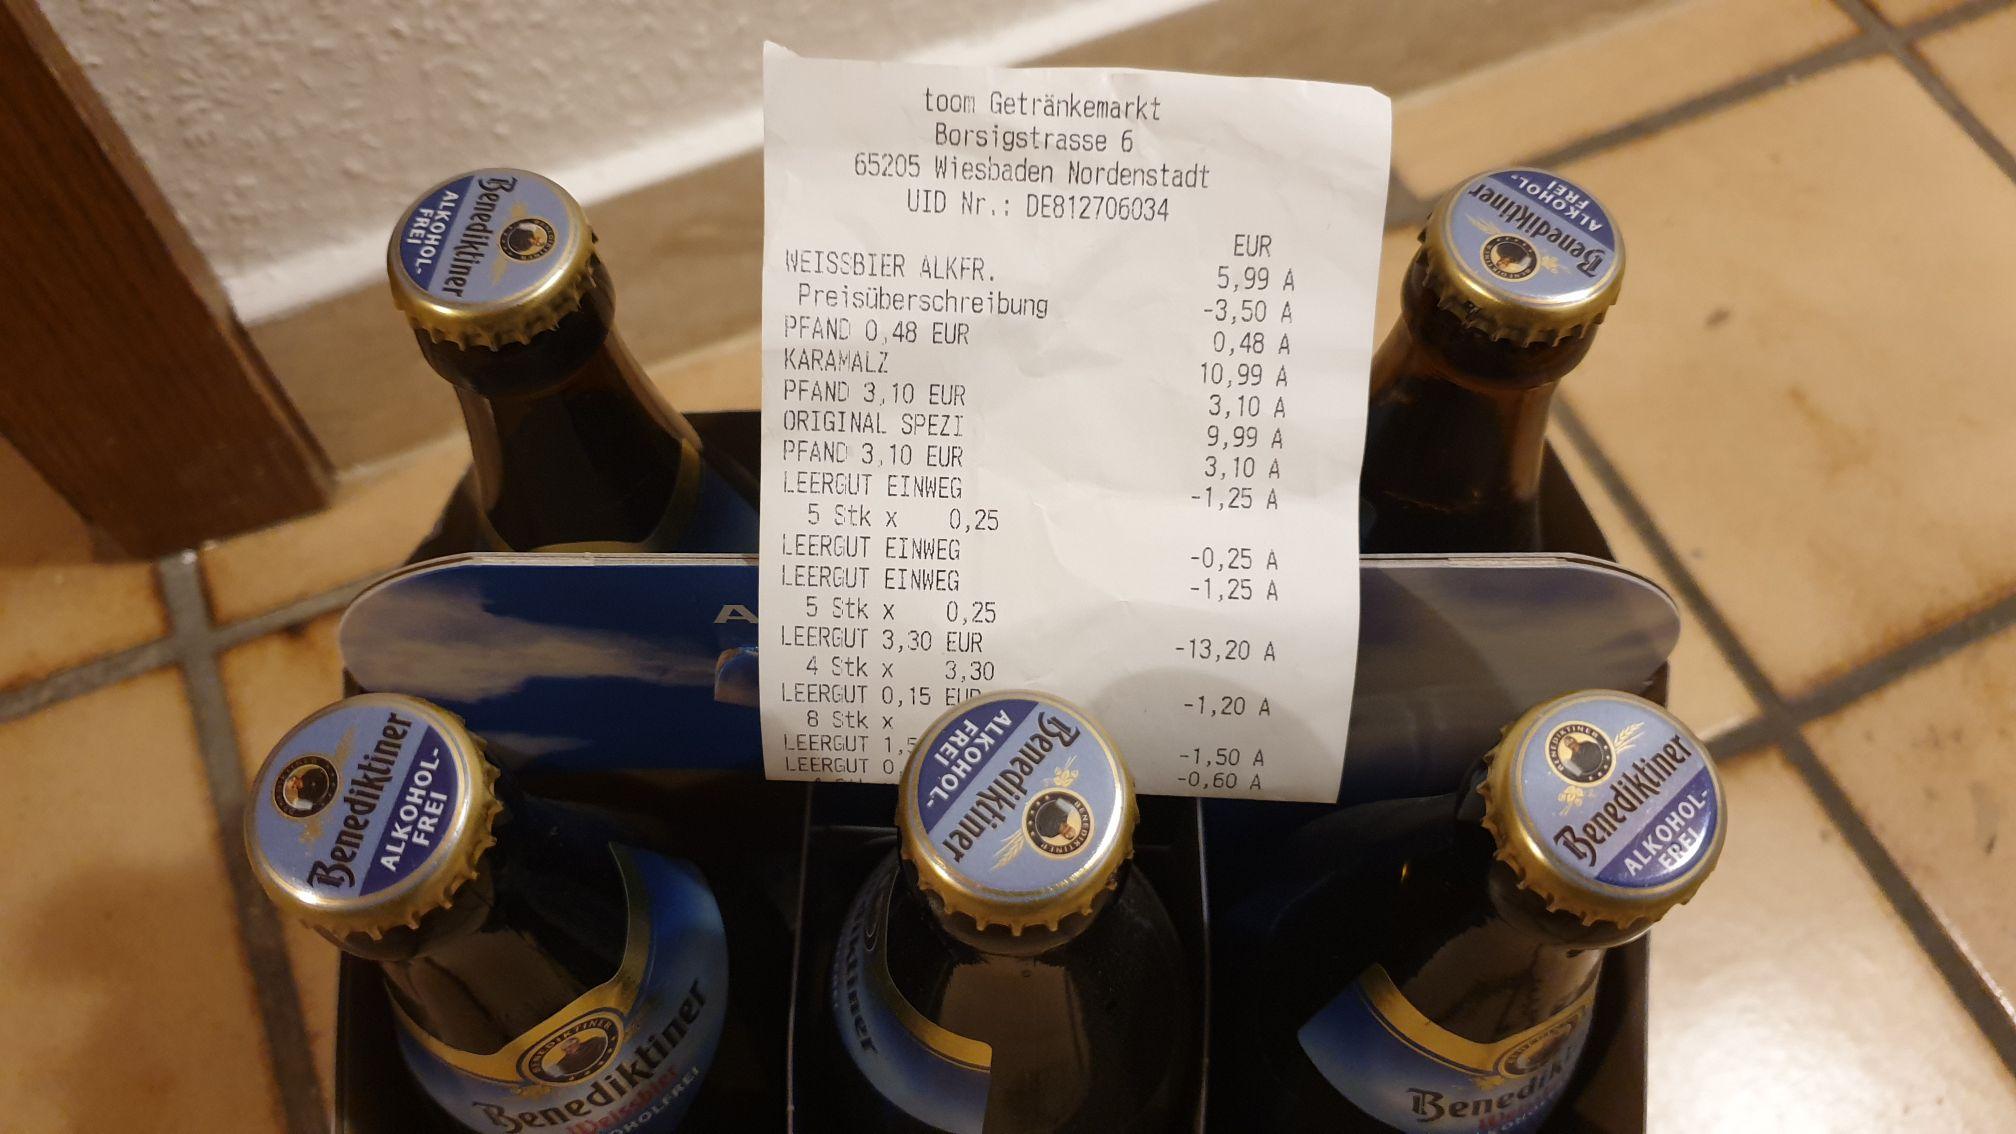 [Lokal Wiesbaden] Benediktiner Weissbier 6x 0,5 Liter / 5x 0,5 Liter plus Weizenbierglas